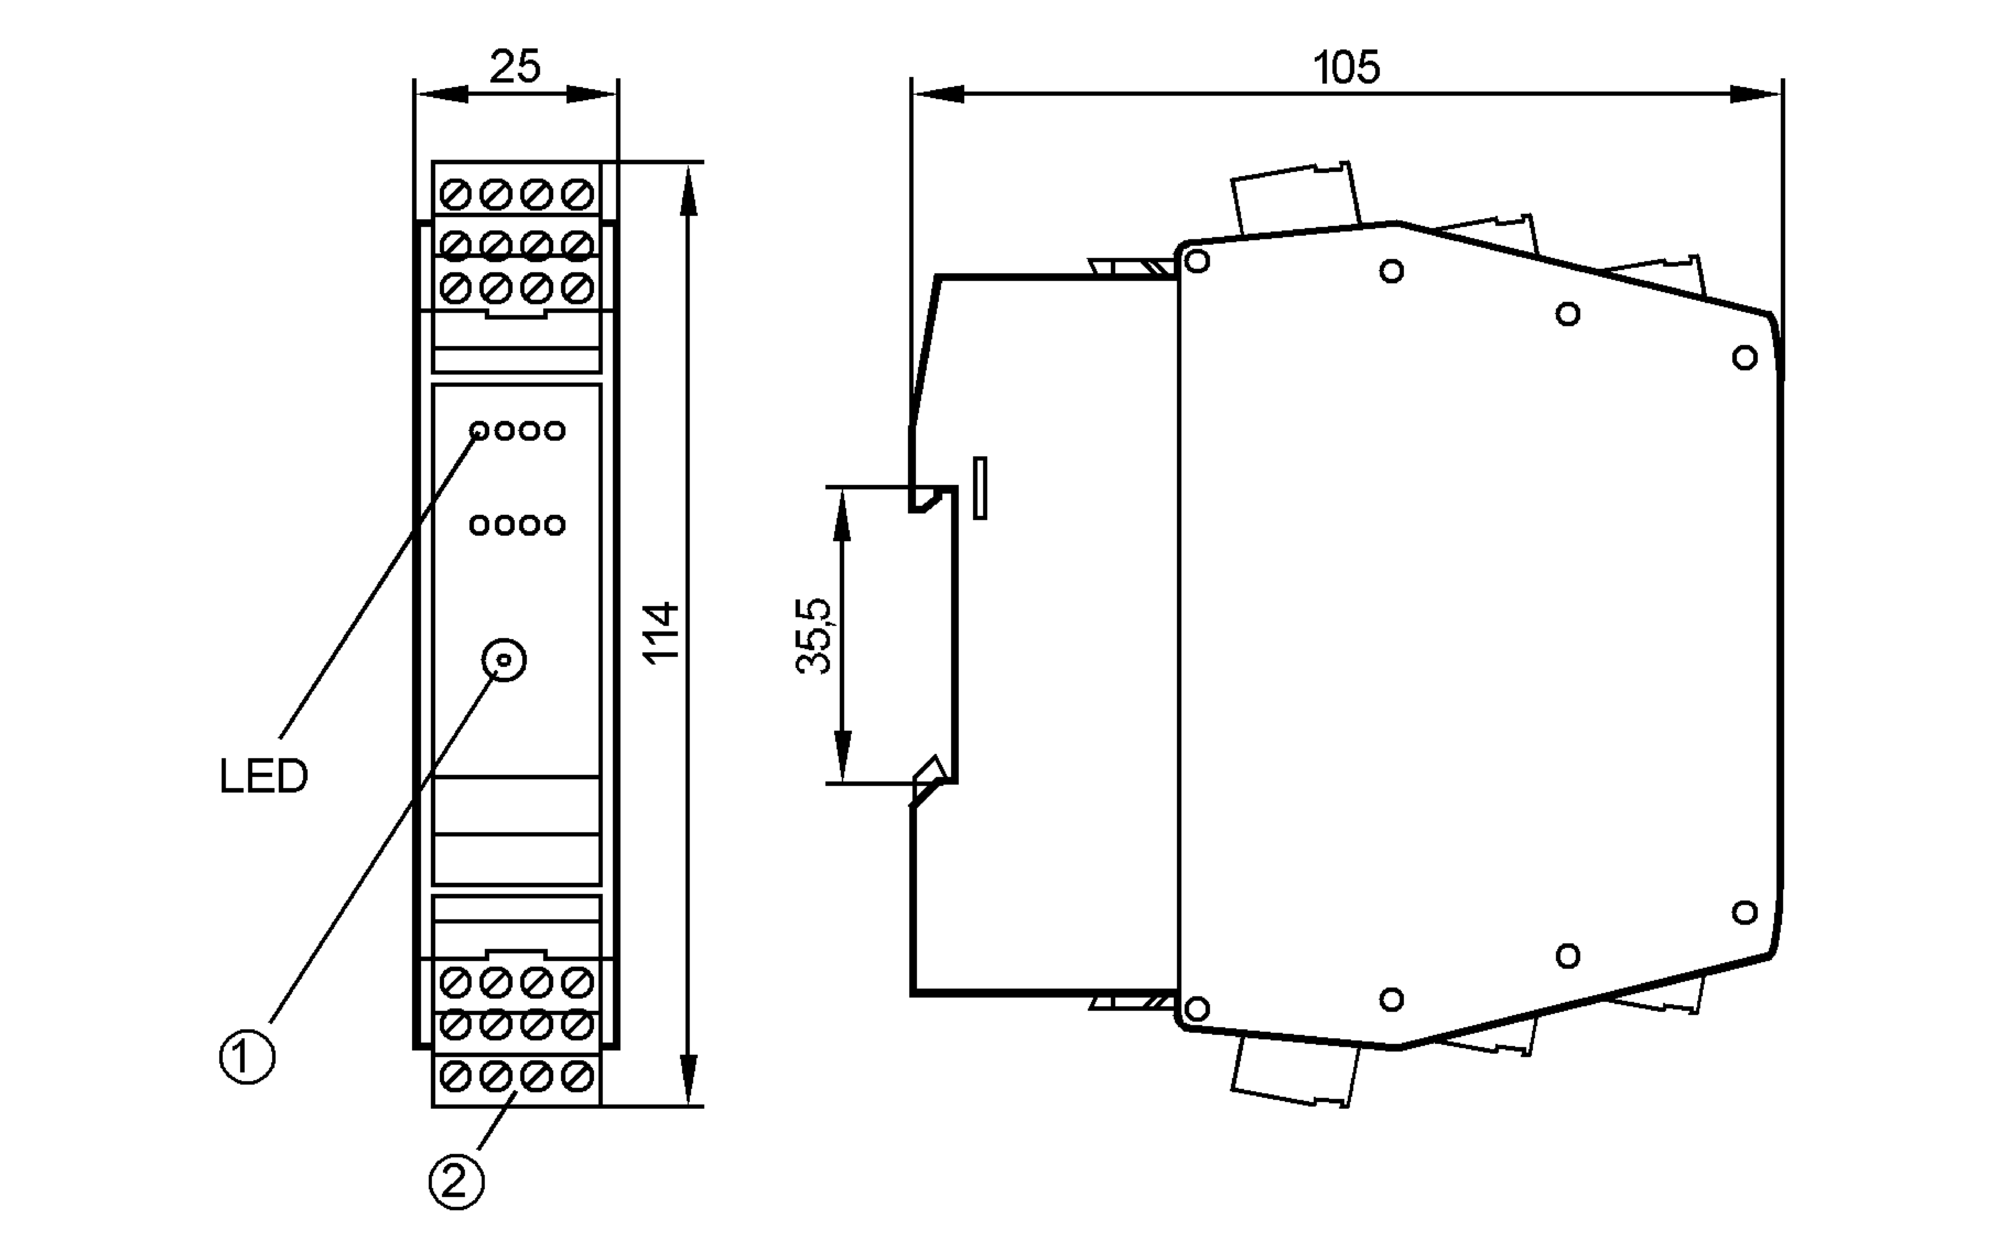 ac2220 - as-interface control cabinet module